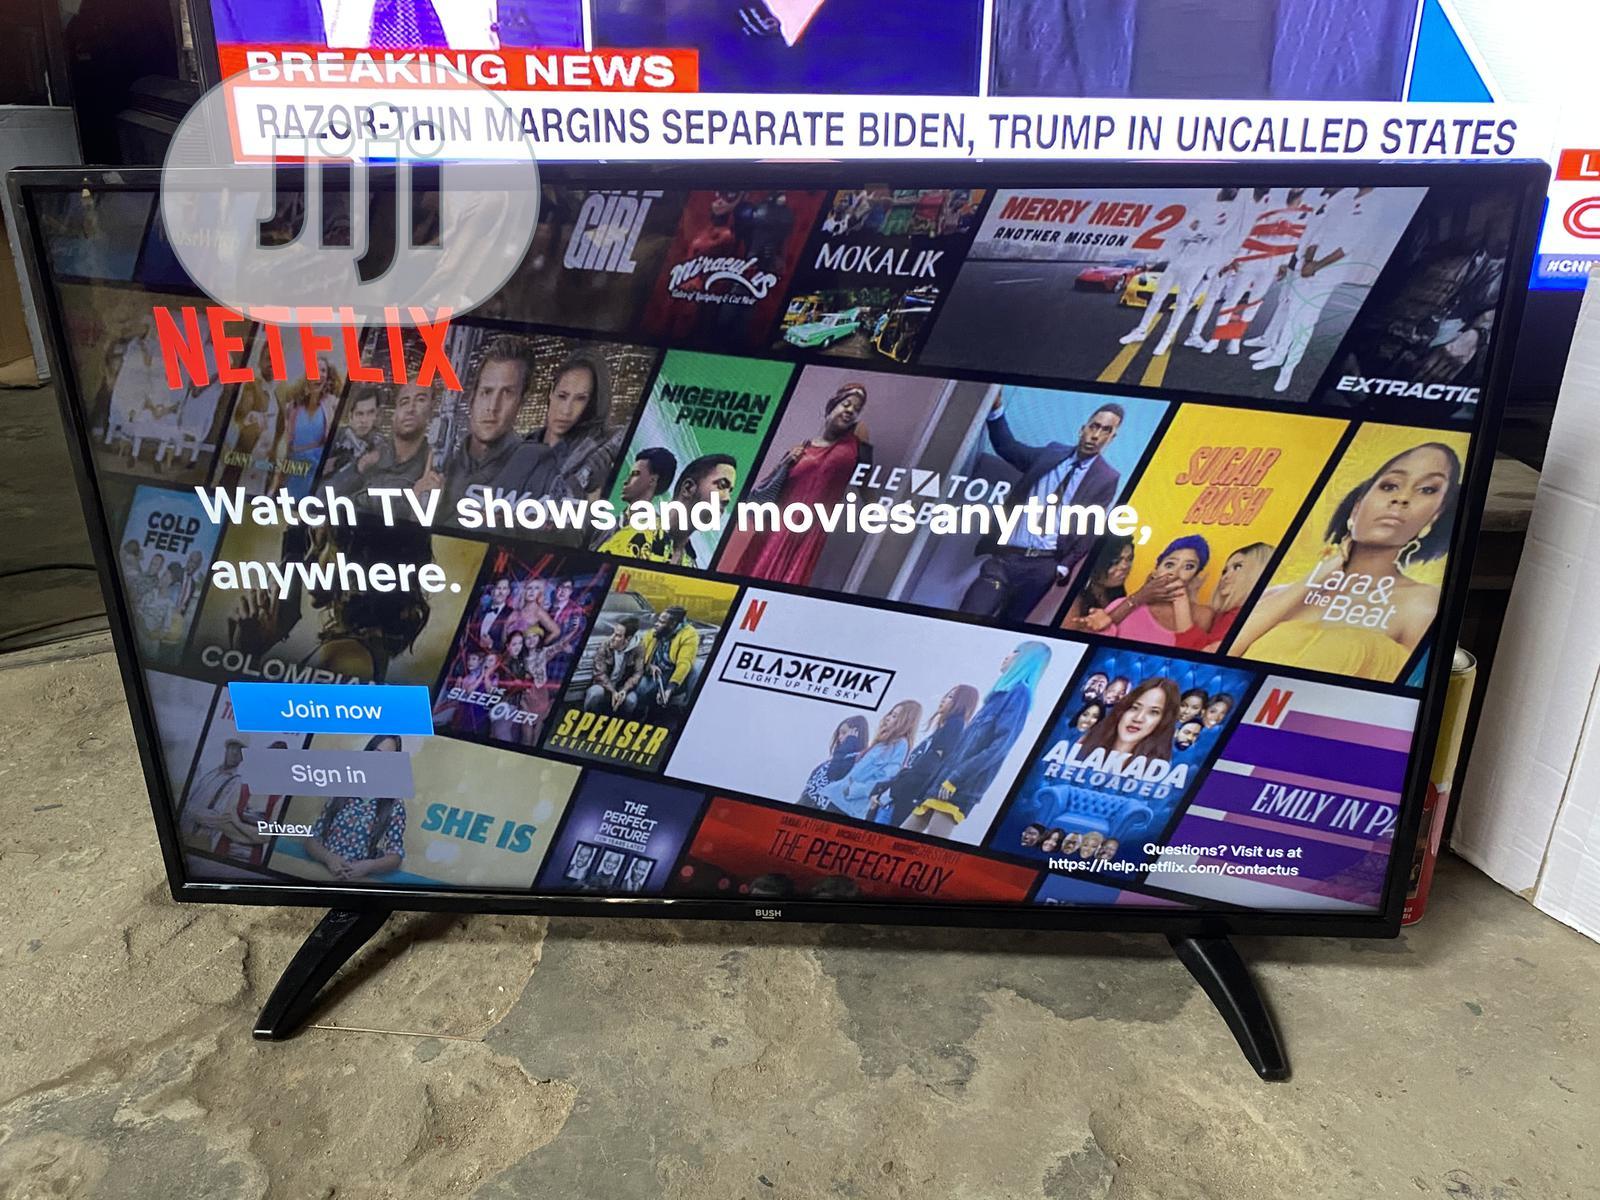 Bush 43inch 4K Uhd Hdr Smart LED TV | TV & DVD Equipment for sale in Ojo, Lagos State, Nigeria